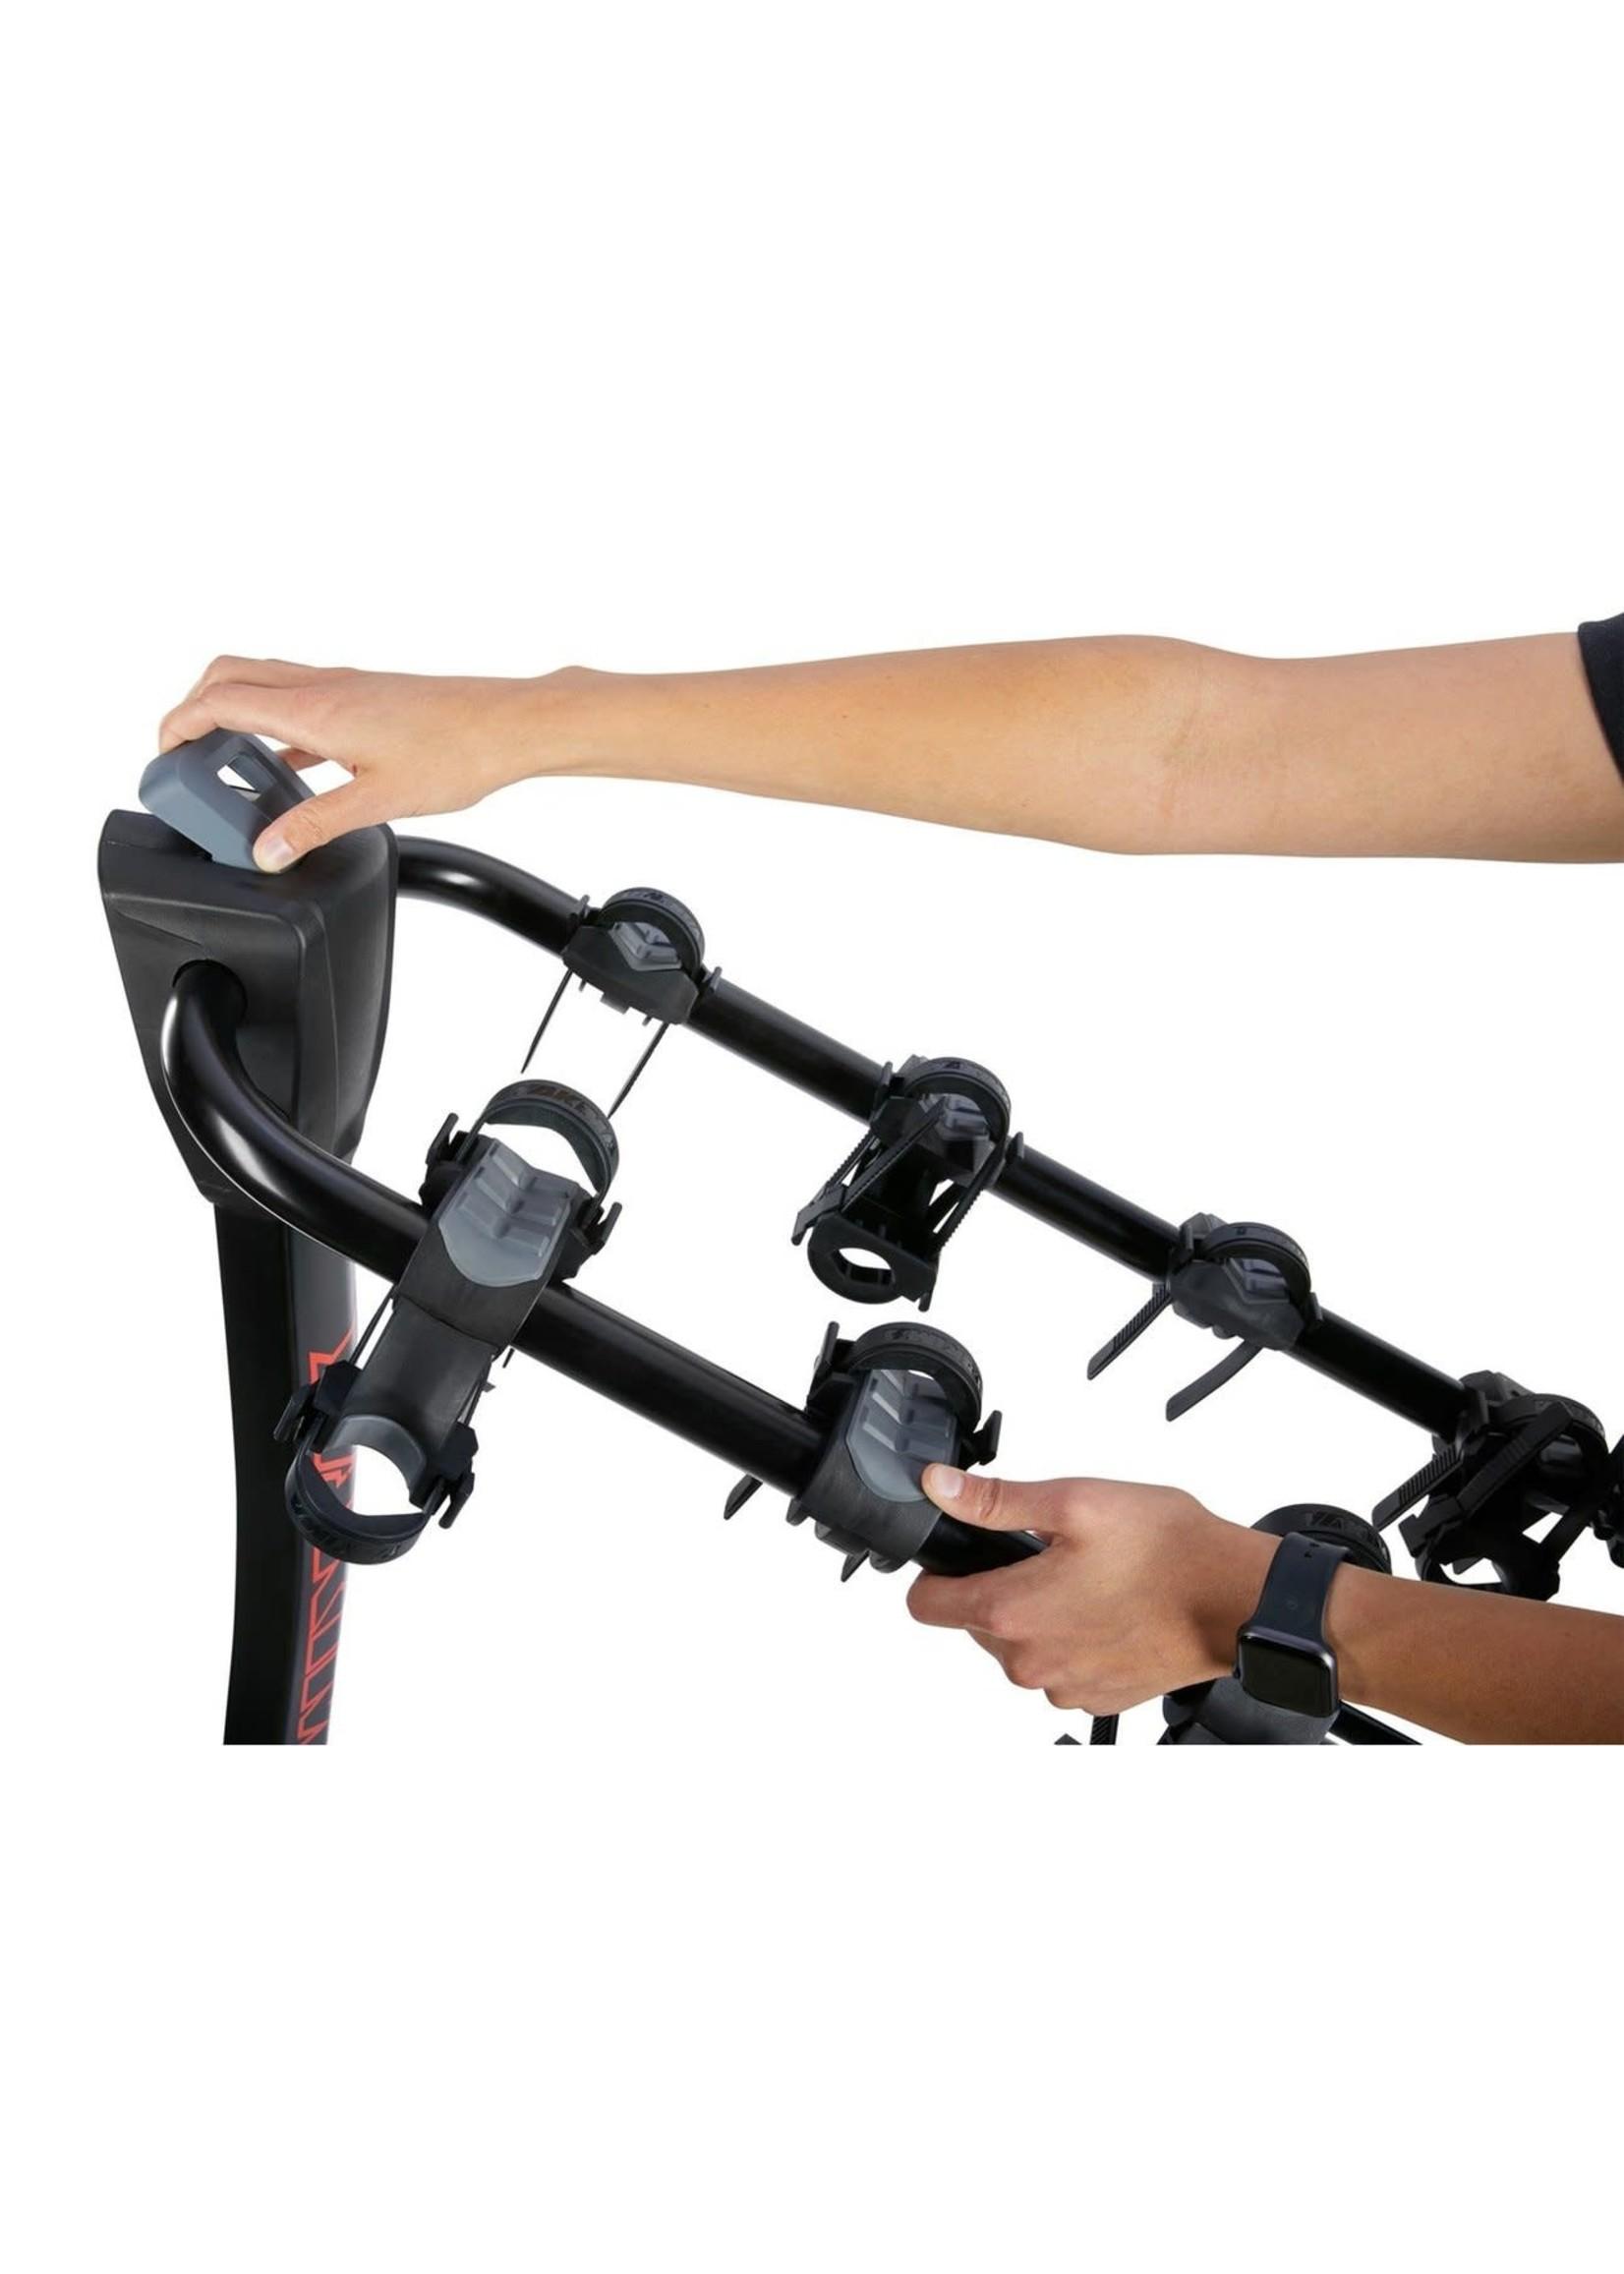 YAKIMA Porte-vélos BACKROAD 2